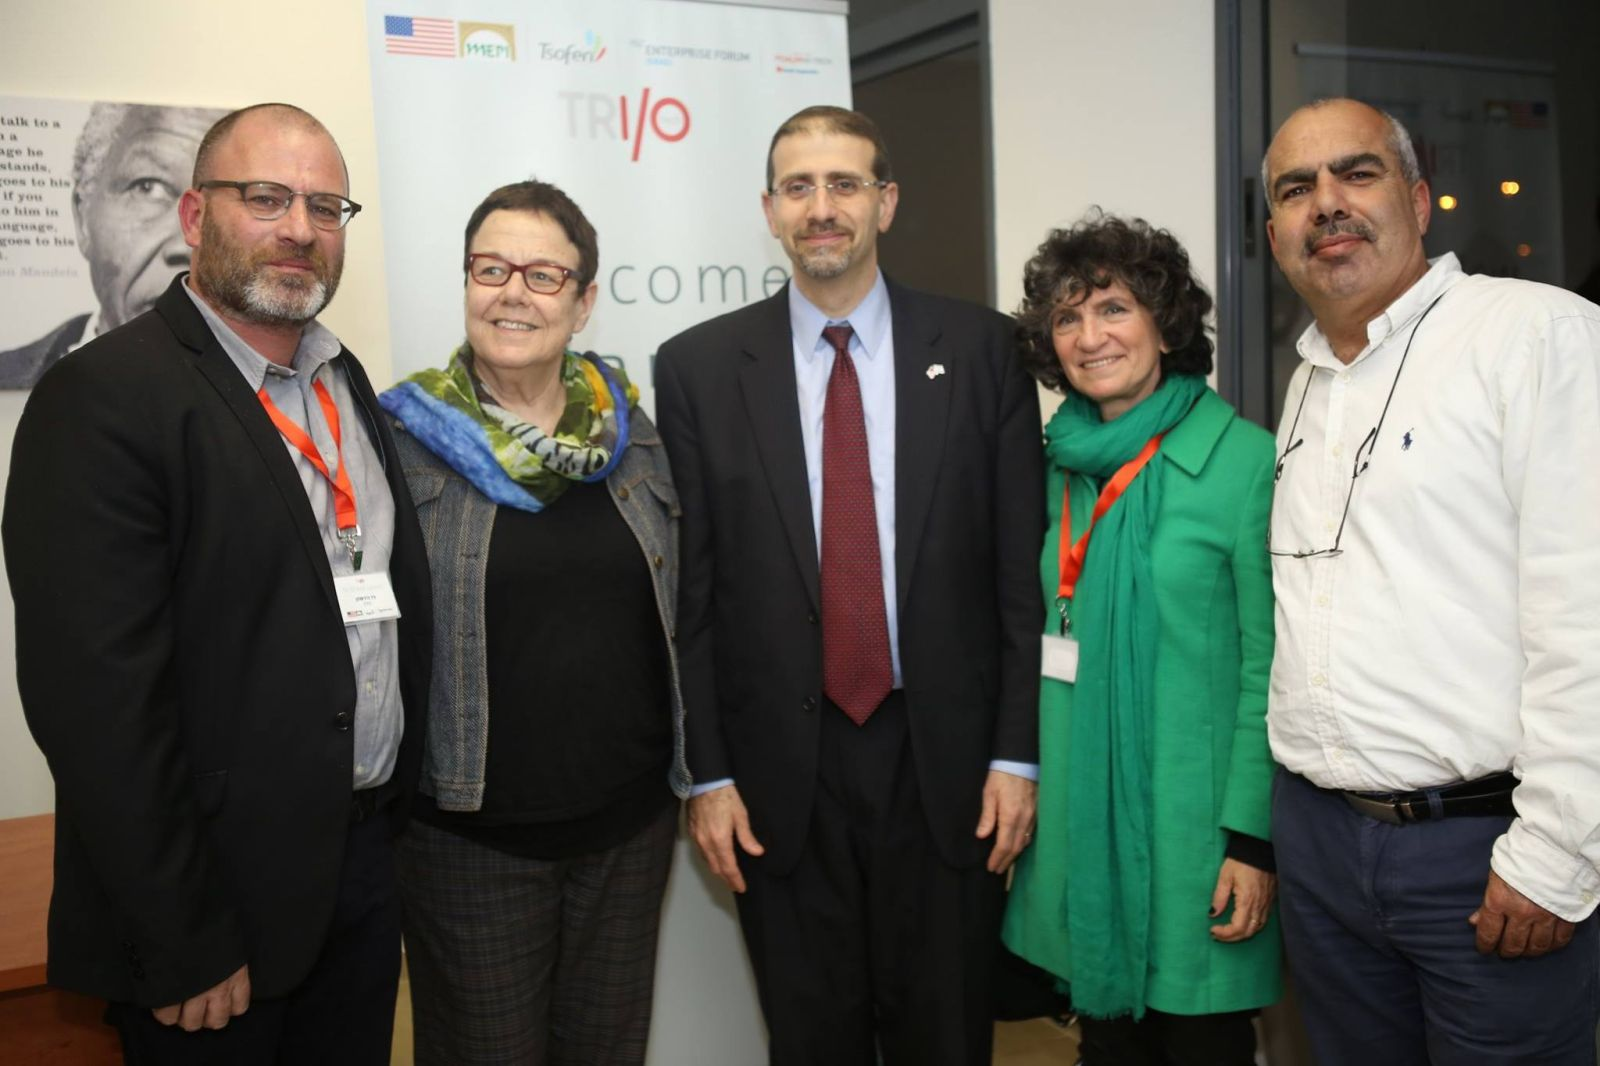 At the opening of TRI/O Tech hub were, from left, Paz Hirschmann, Smadar Nehab, US Ambassador Dan Shapiro, Ayla Matalon and Sami Saadi. Photo from Facebook